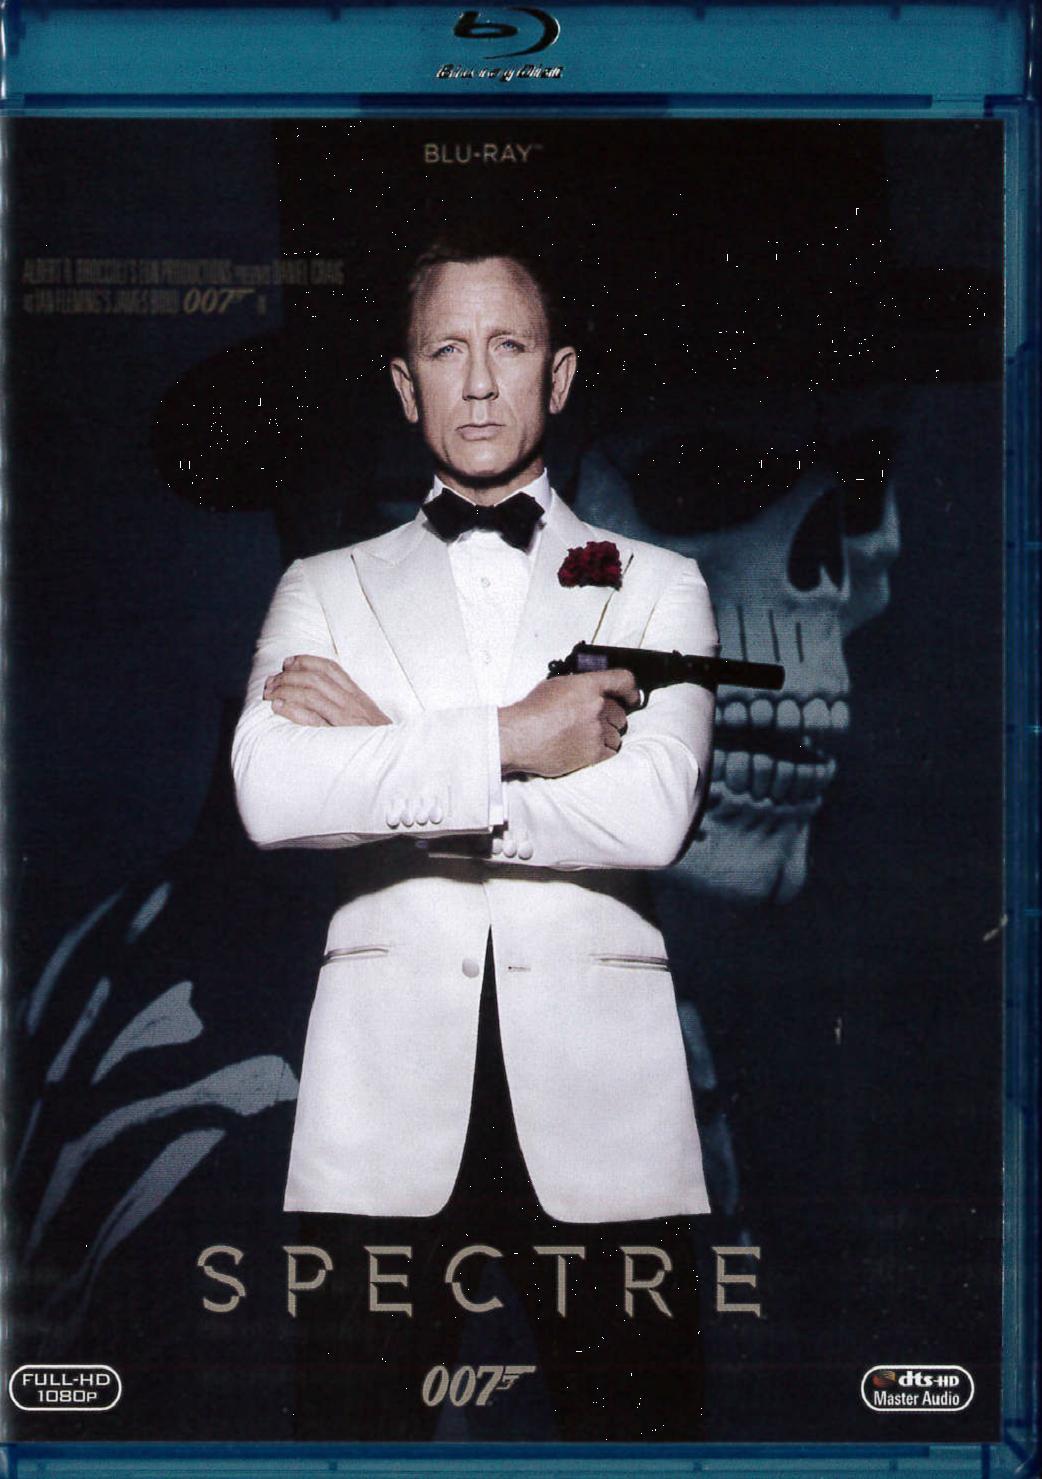 007 - SPECTRE (BLU RAY+DVD) - USATO